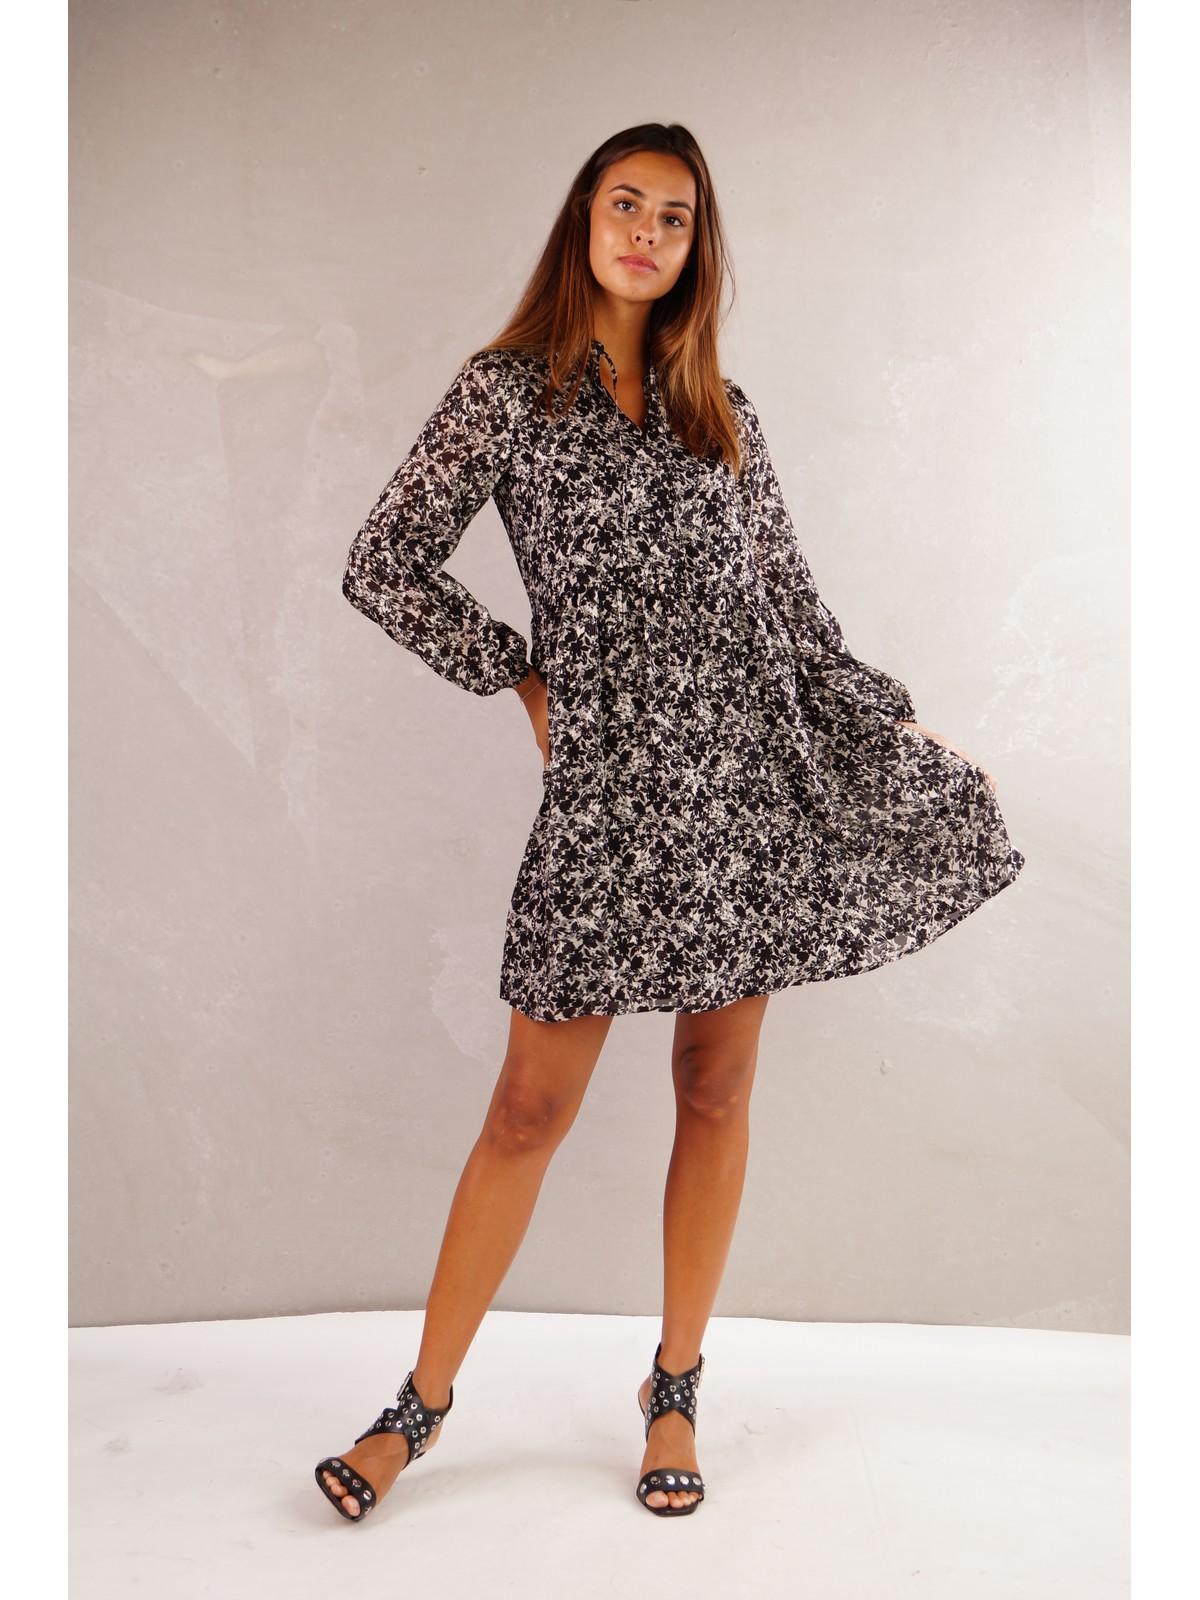 Justeve - Dress Anais - Owen - black beige